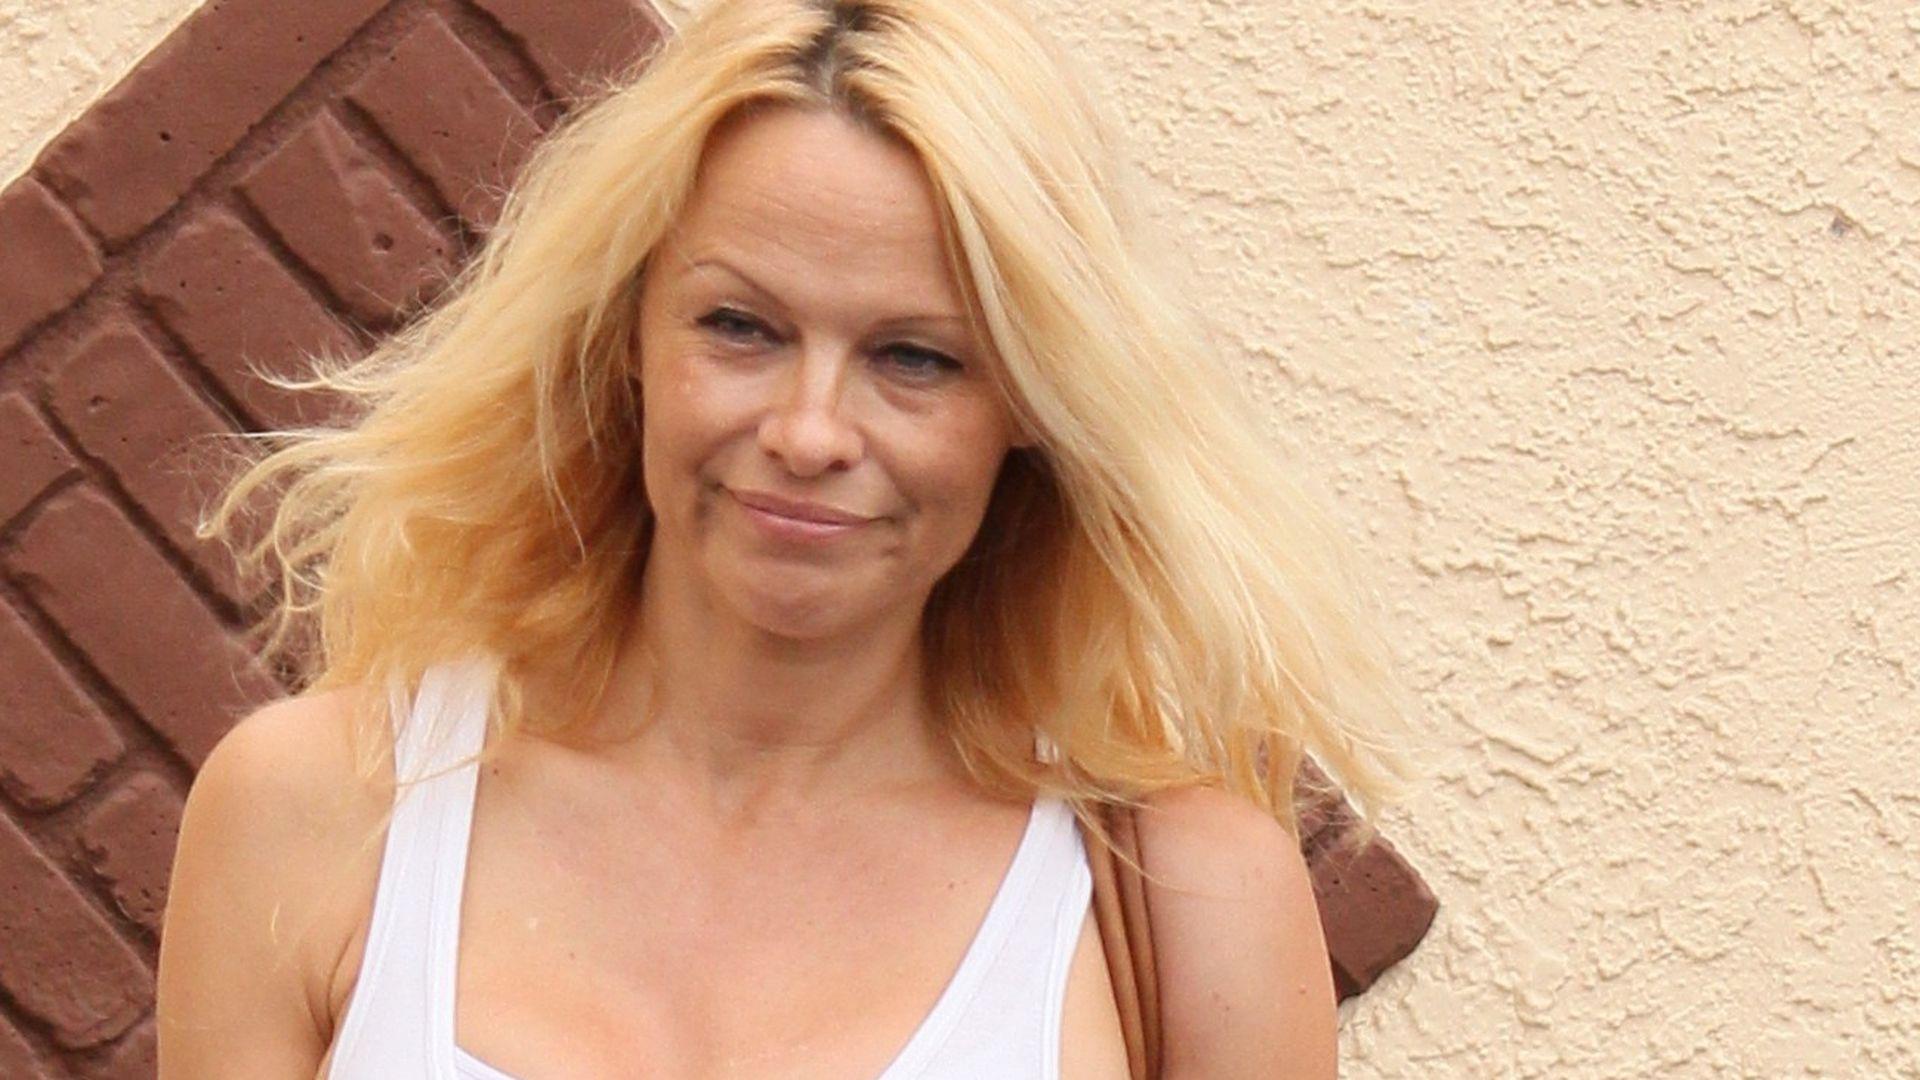 Stars - Video - Pamela Anderson komplett nackt - ProSieben